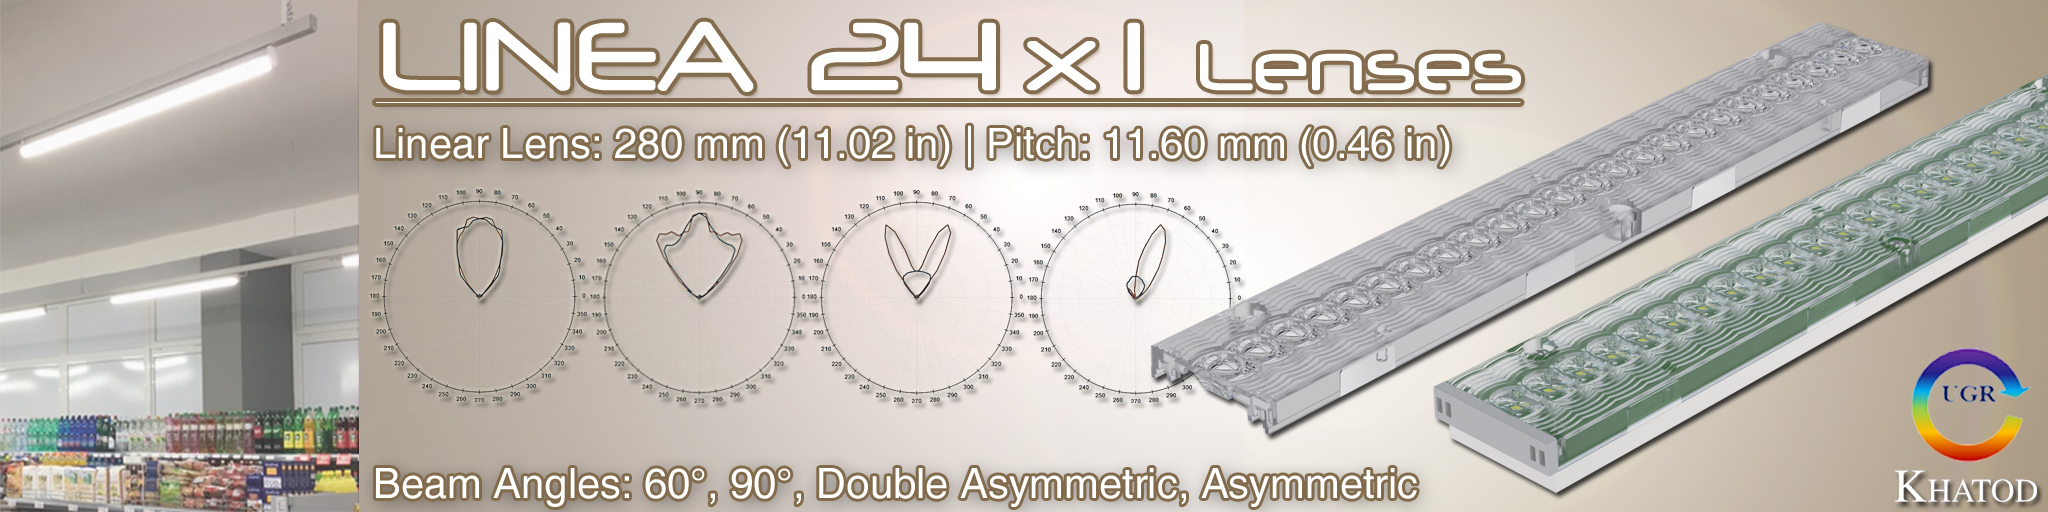 LINEA 24x1 Lenses